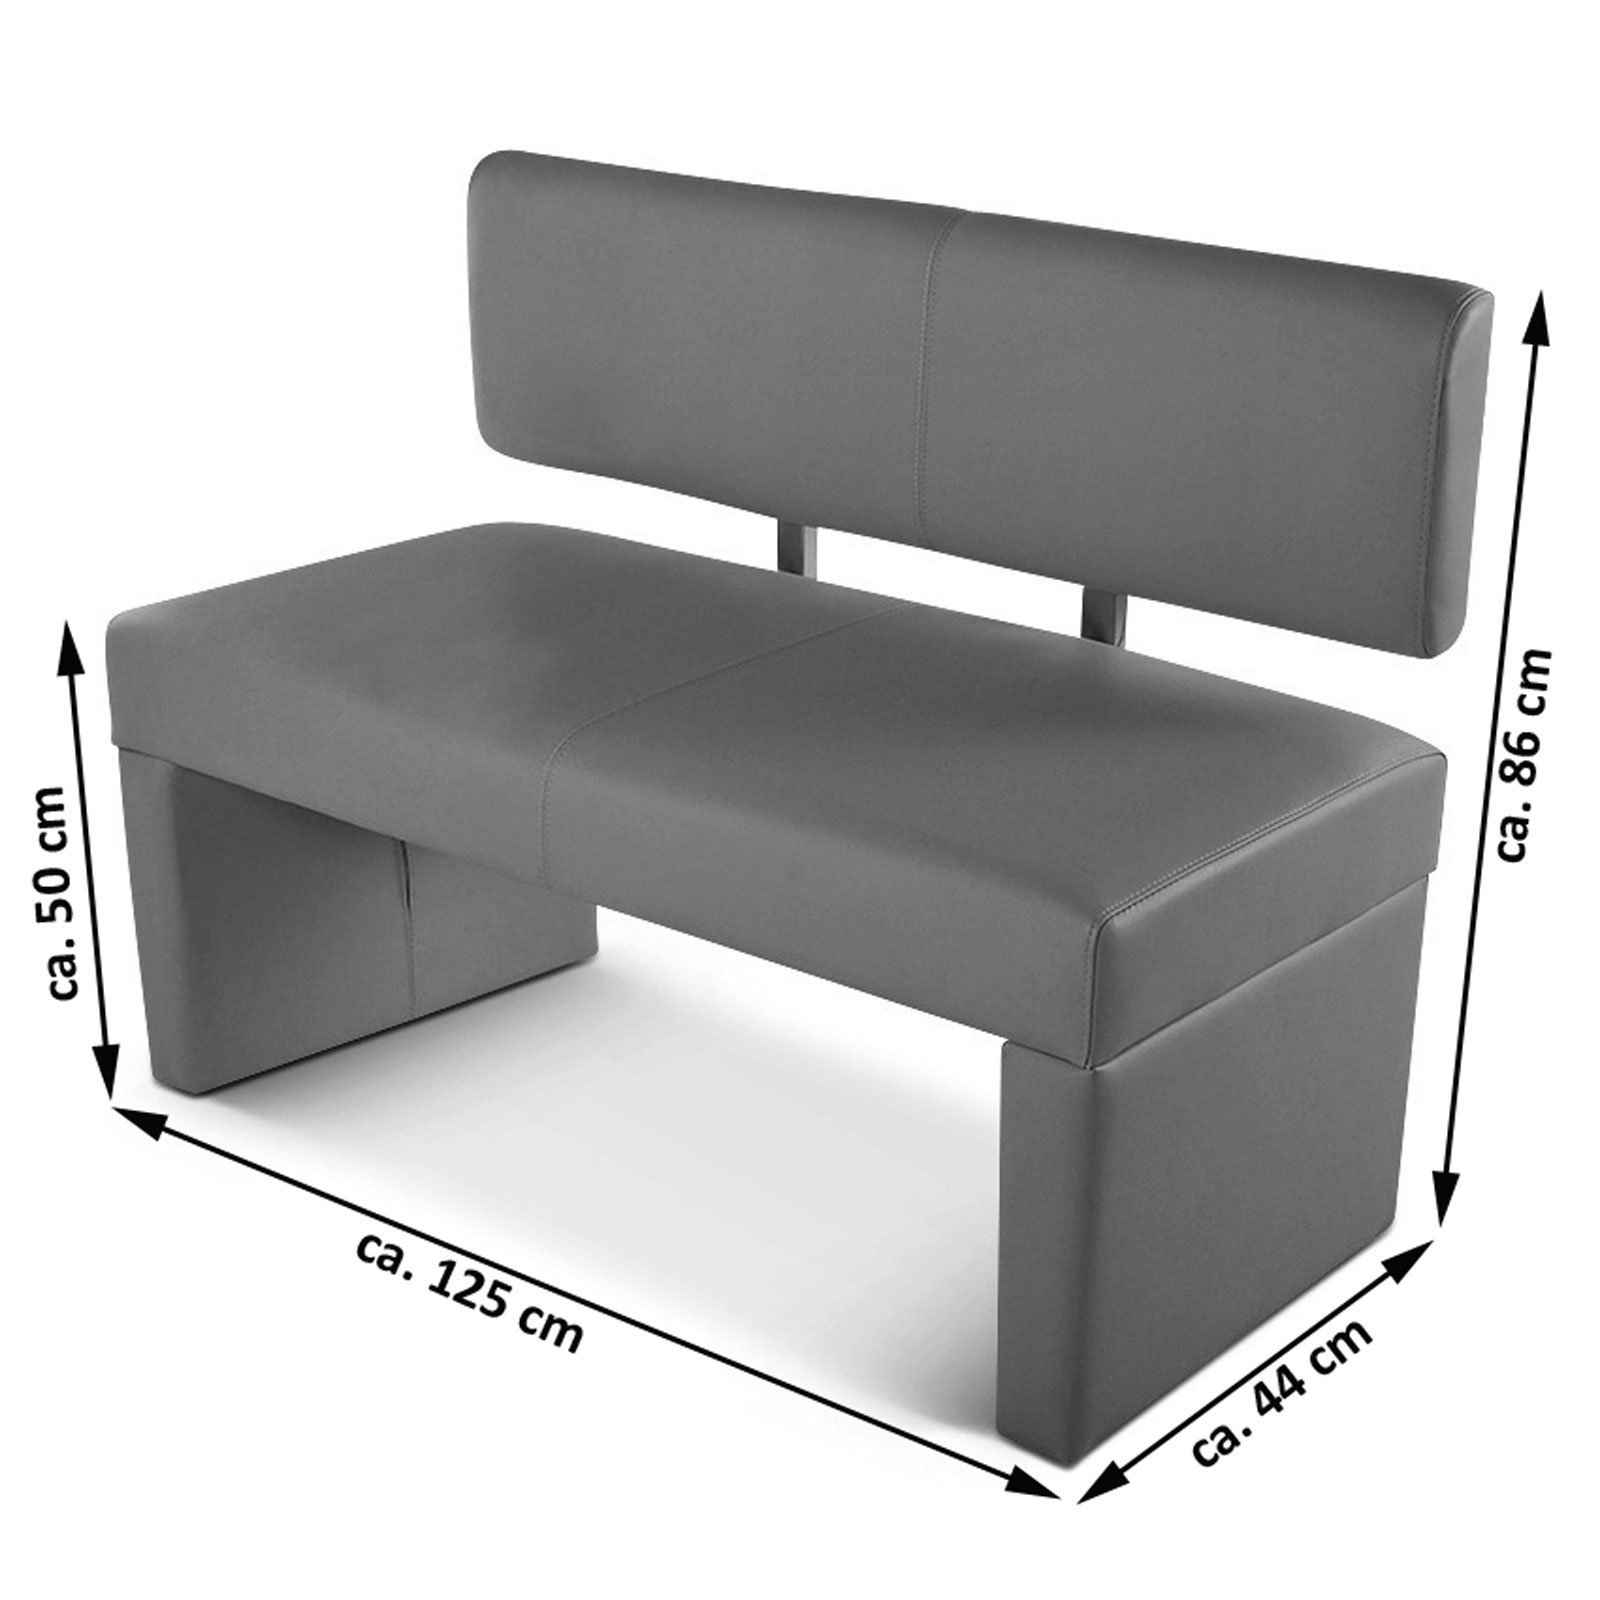 sitzbank kche mit lehne sitzbank kche mit lehne with. Black Bedroom Furniture Sets. Home Design Ideas